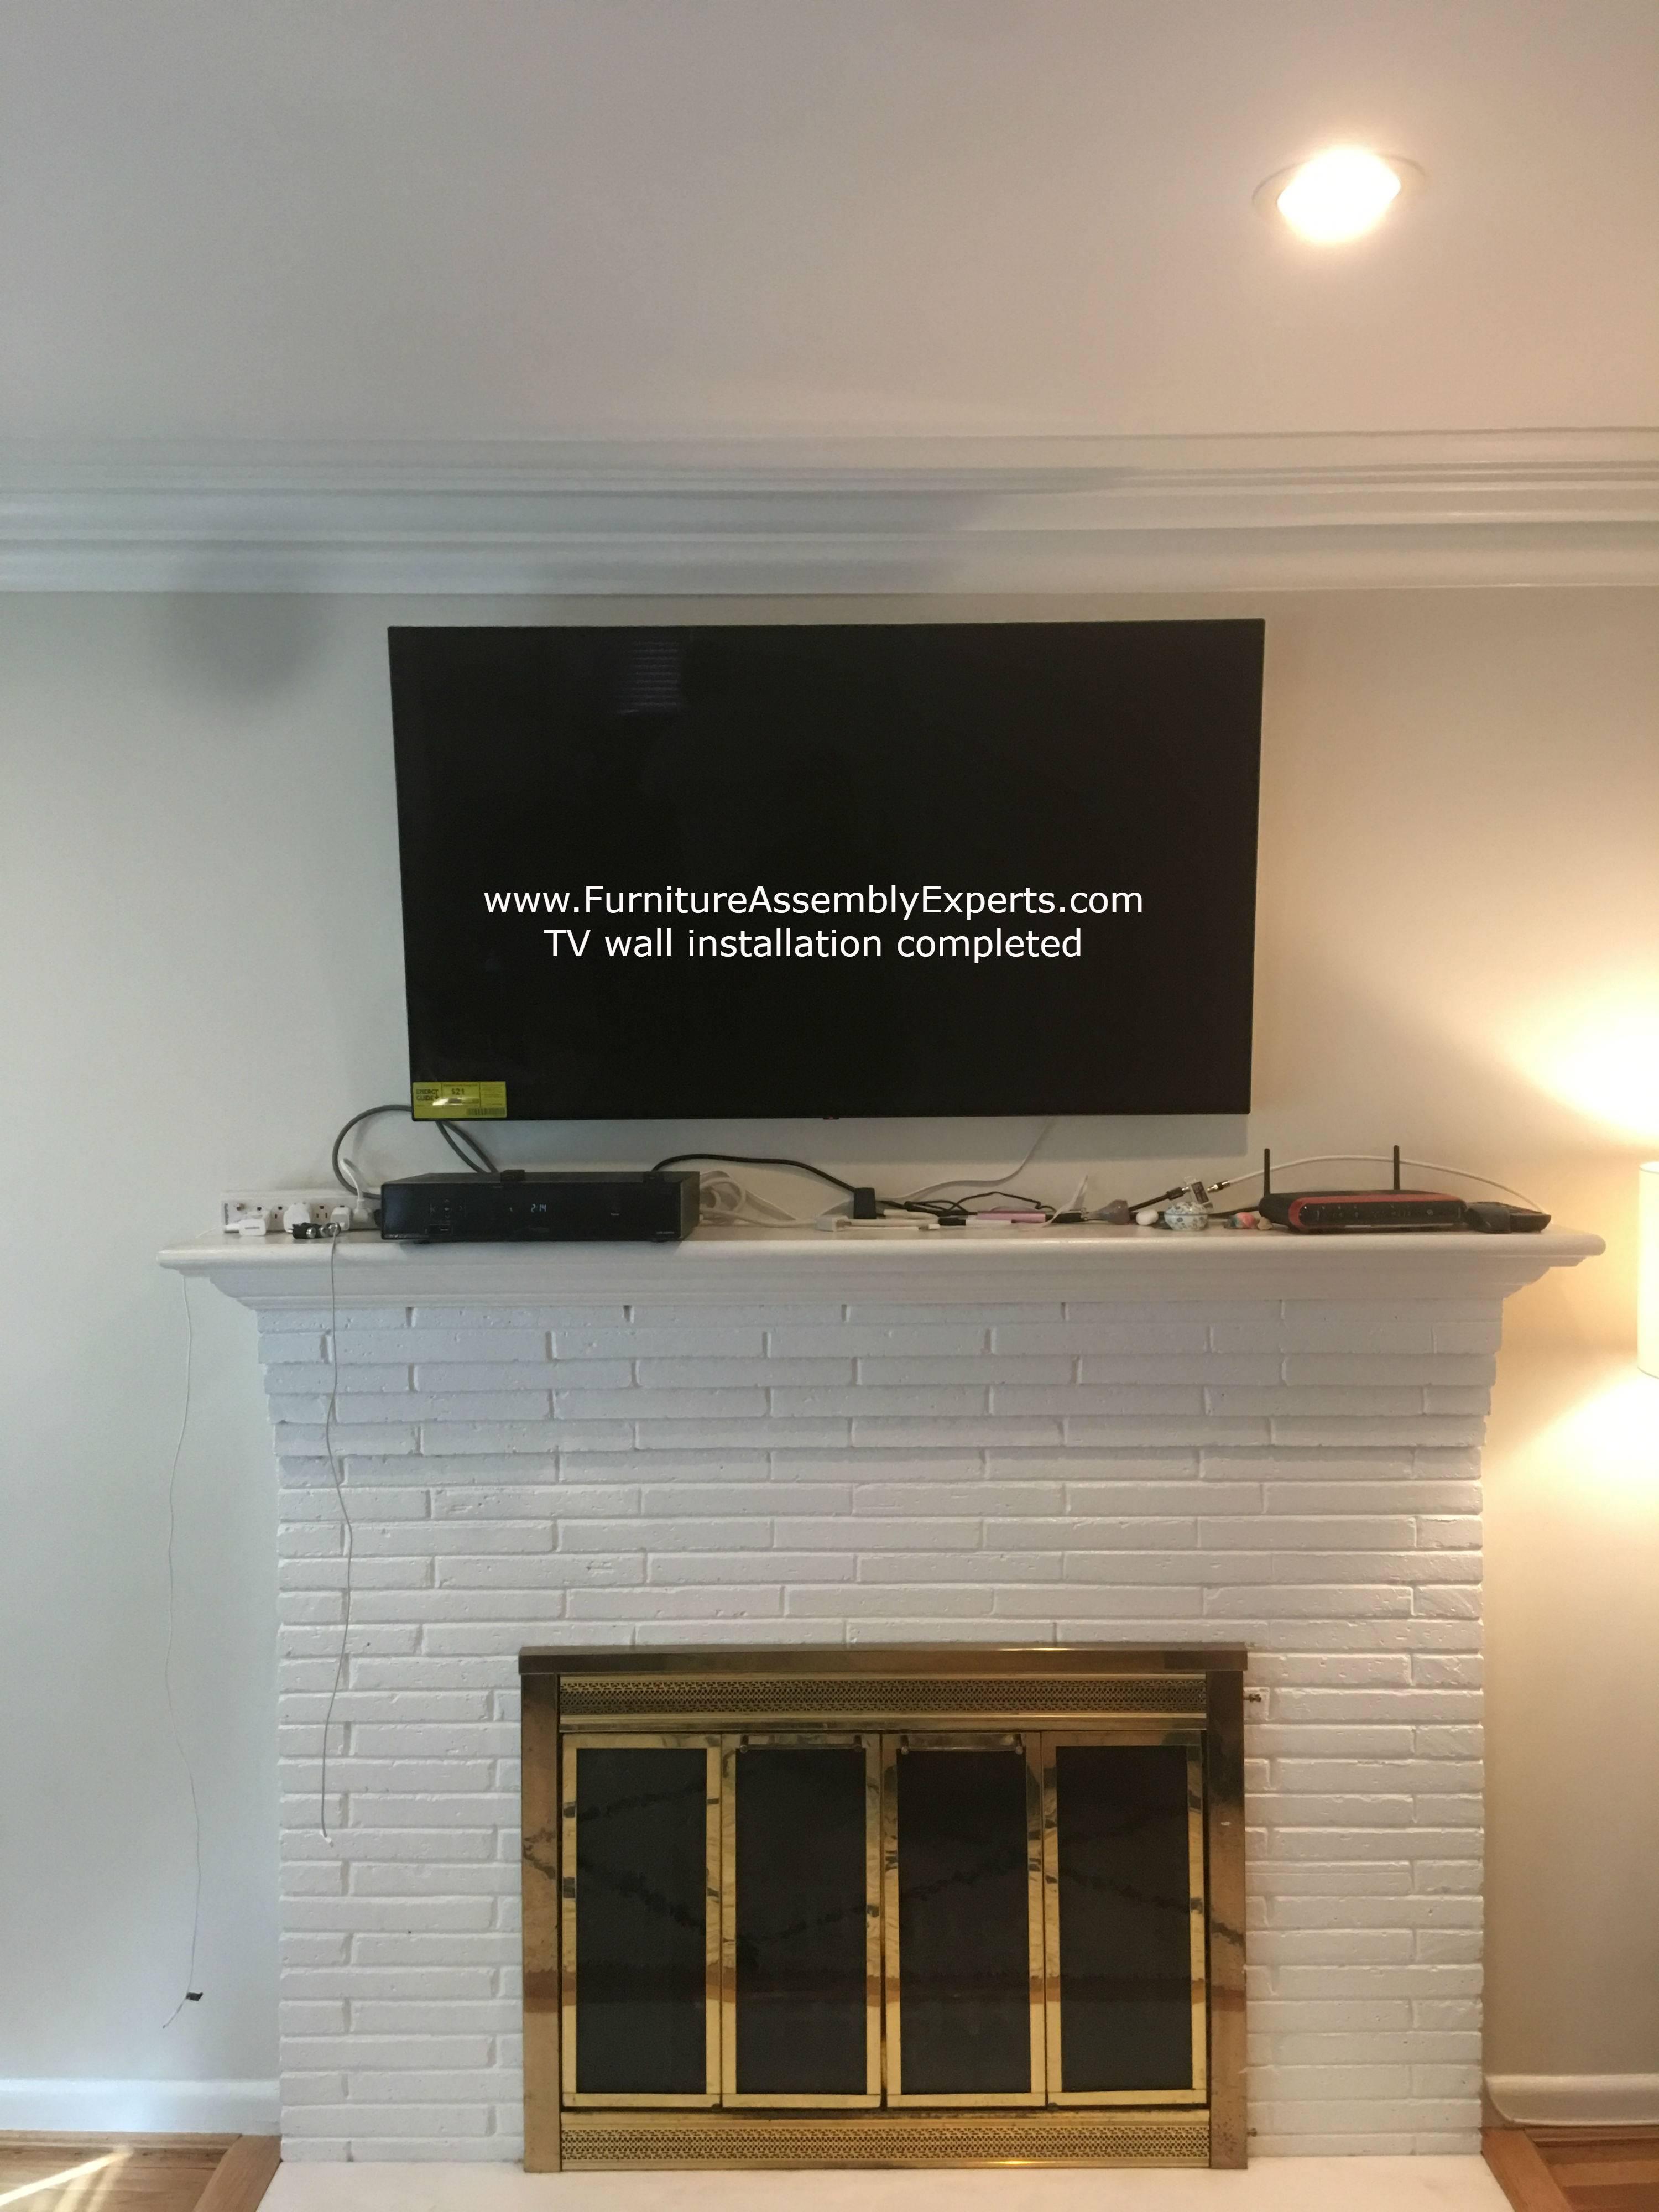 Fireplace tv wall installation in Washington DC